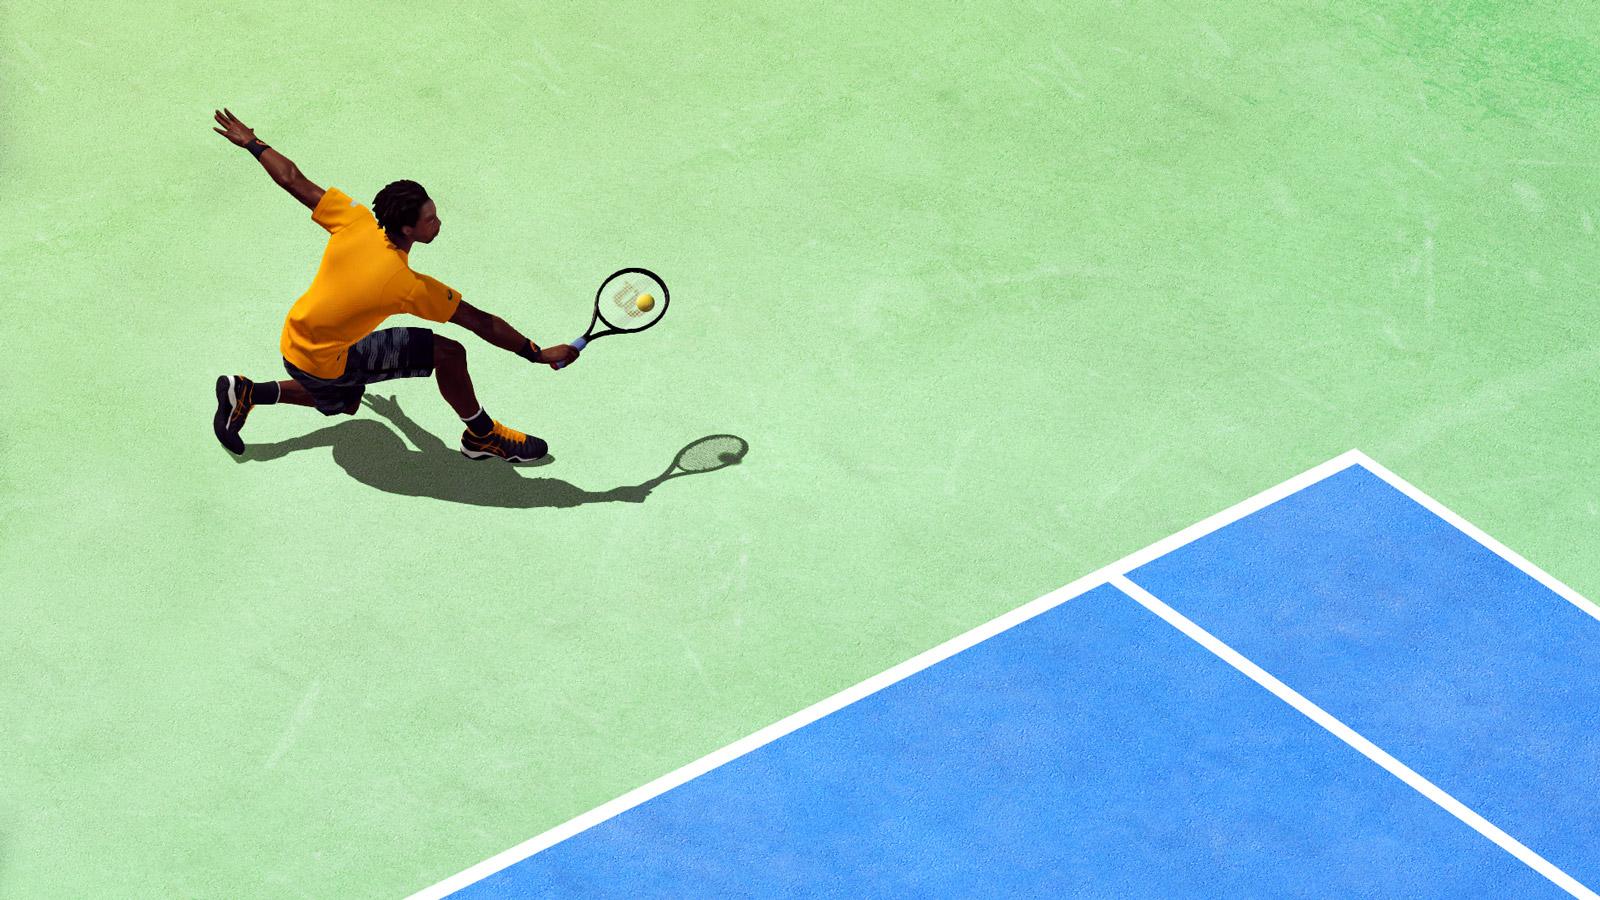 Tennis World Tour Wallpaper in 1600x900